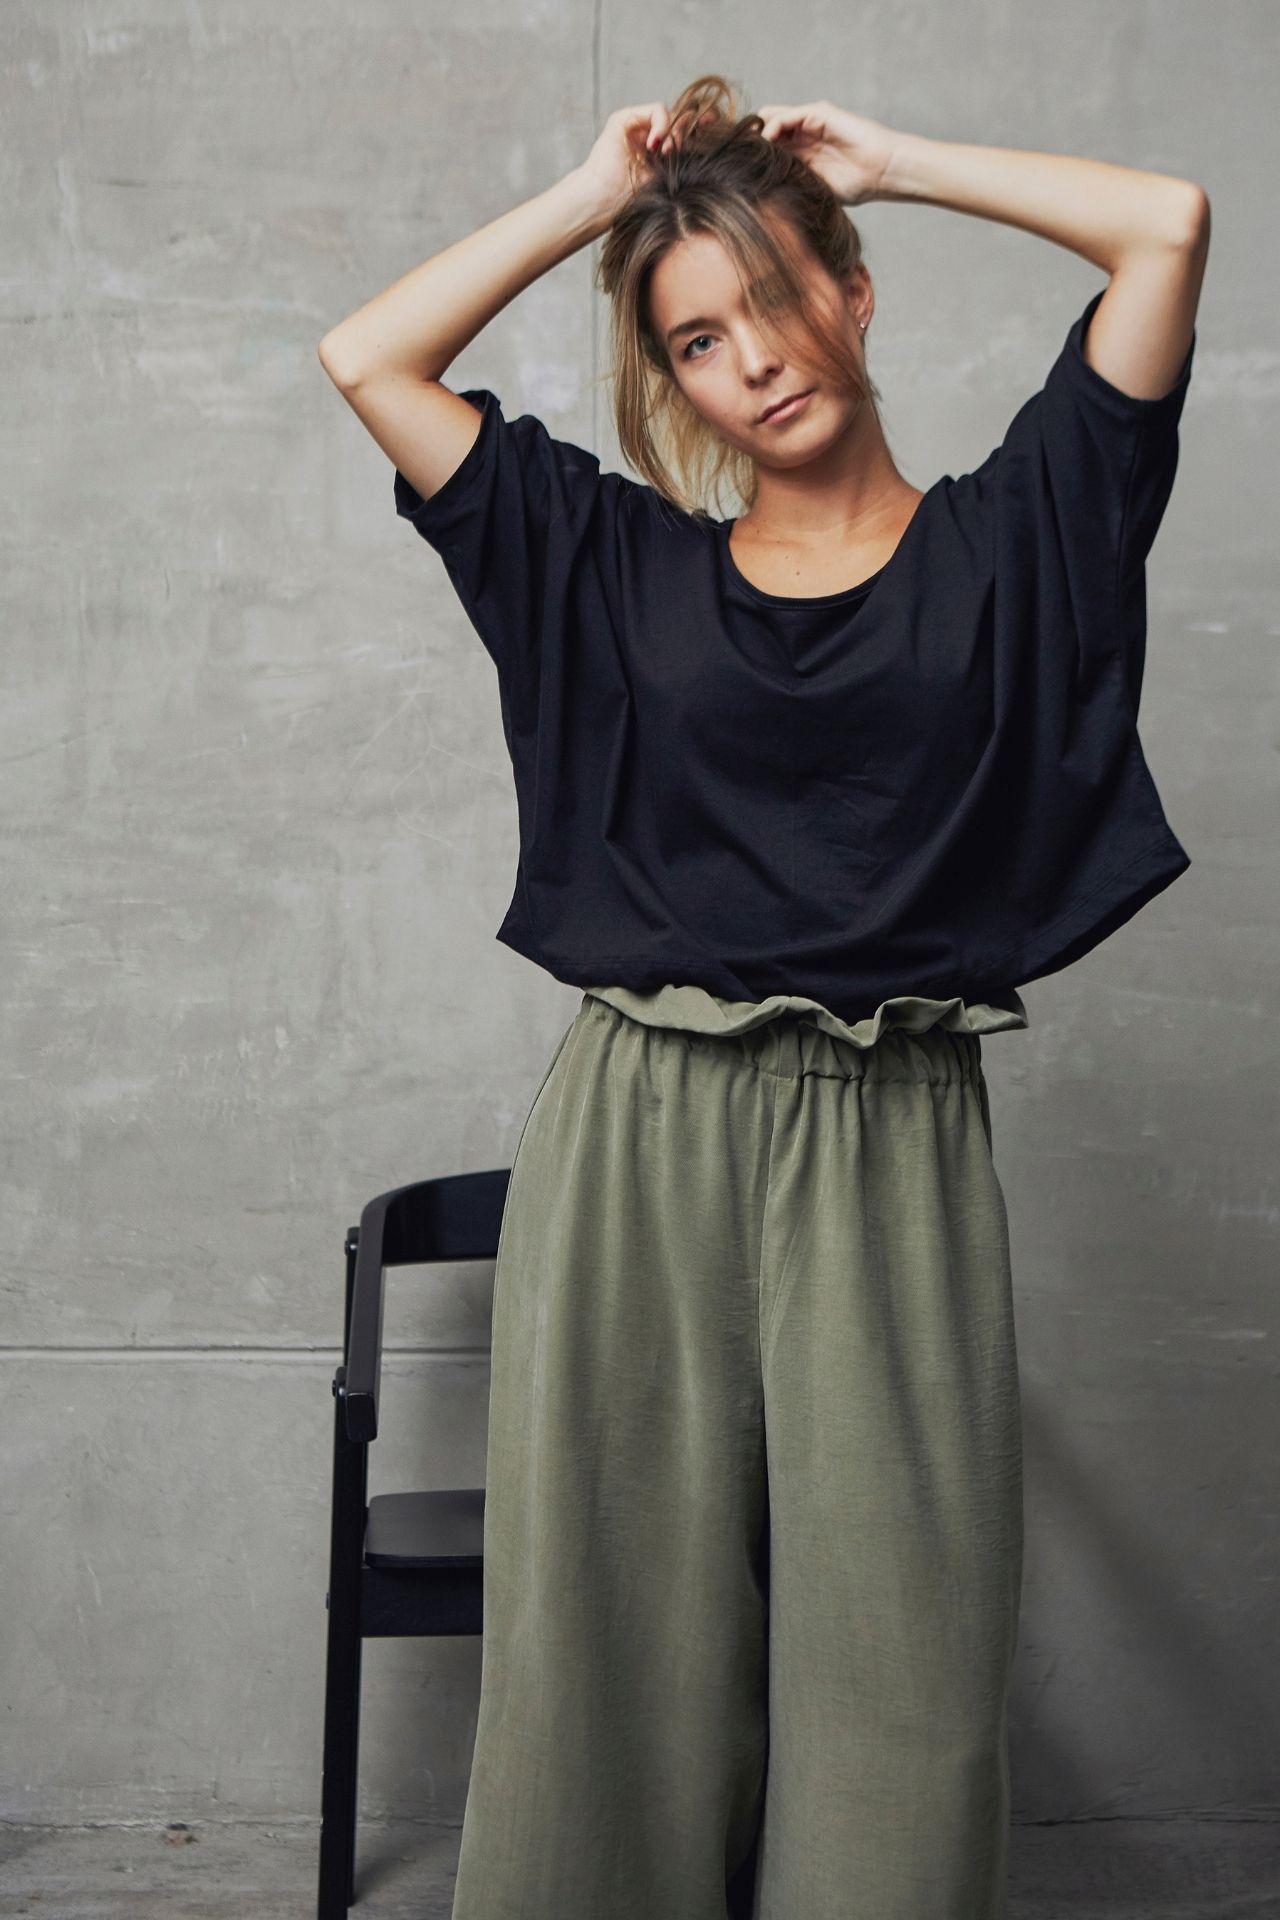 Polo oversized 100% algodon de silueta holgada, corte kimono y largo cropped. Ideal para usarlo con pantalones a la cintura  Talla única  Busto: 160 cm  Cintura: 131 cm